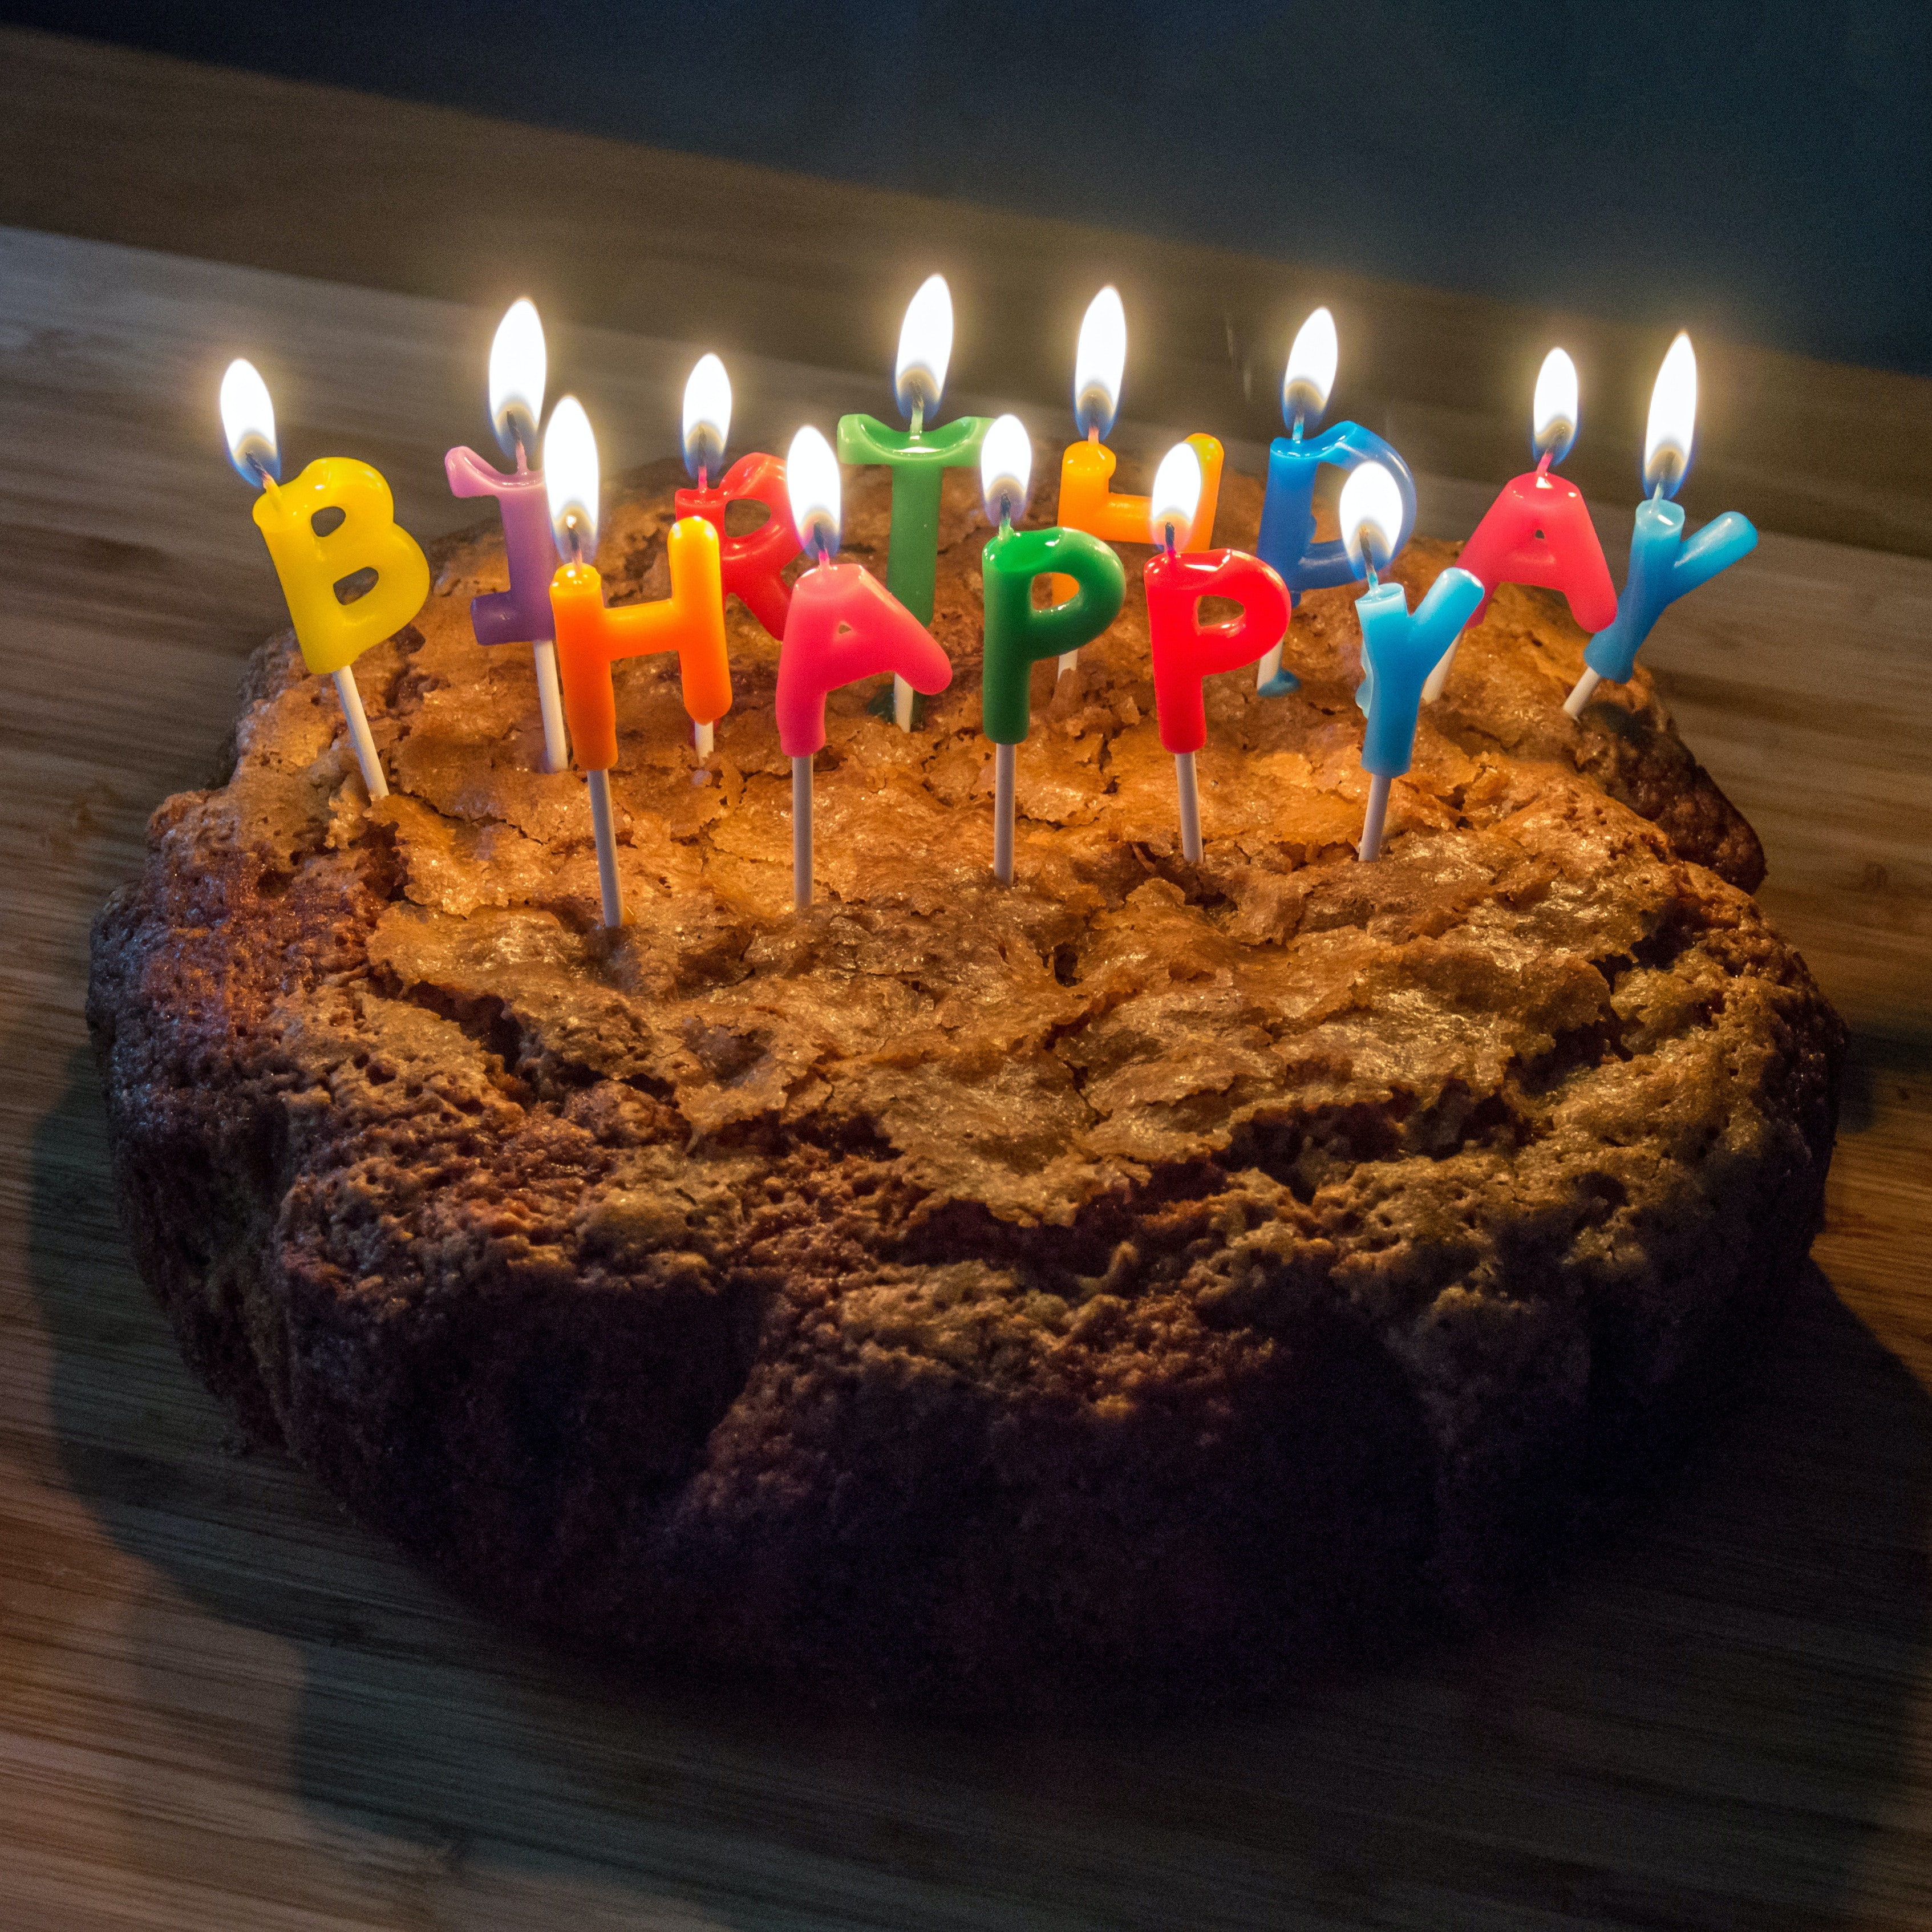 Free Stock Photo Of Birthday Cake Cake Candles